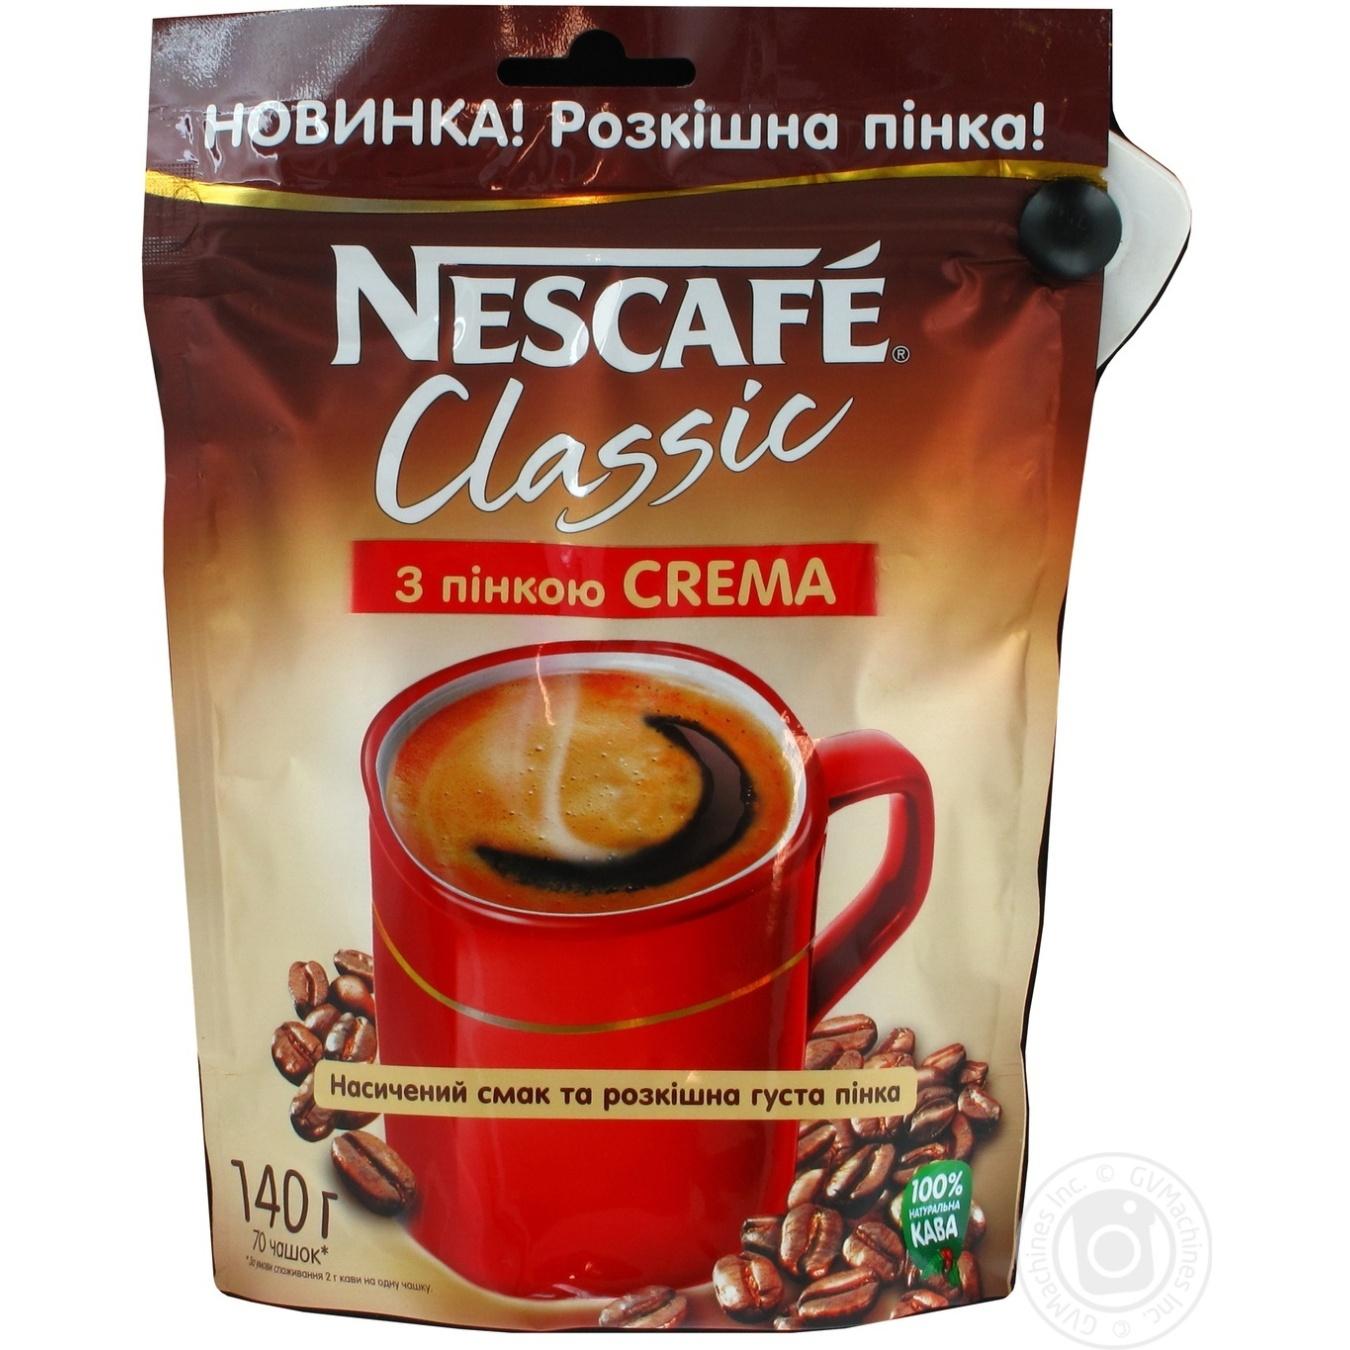 Natural instant coffee Nescafe Classic Crema 140g Ukraine → Drinks → Coffee → Instant coffee ...